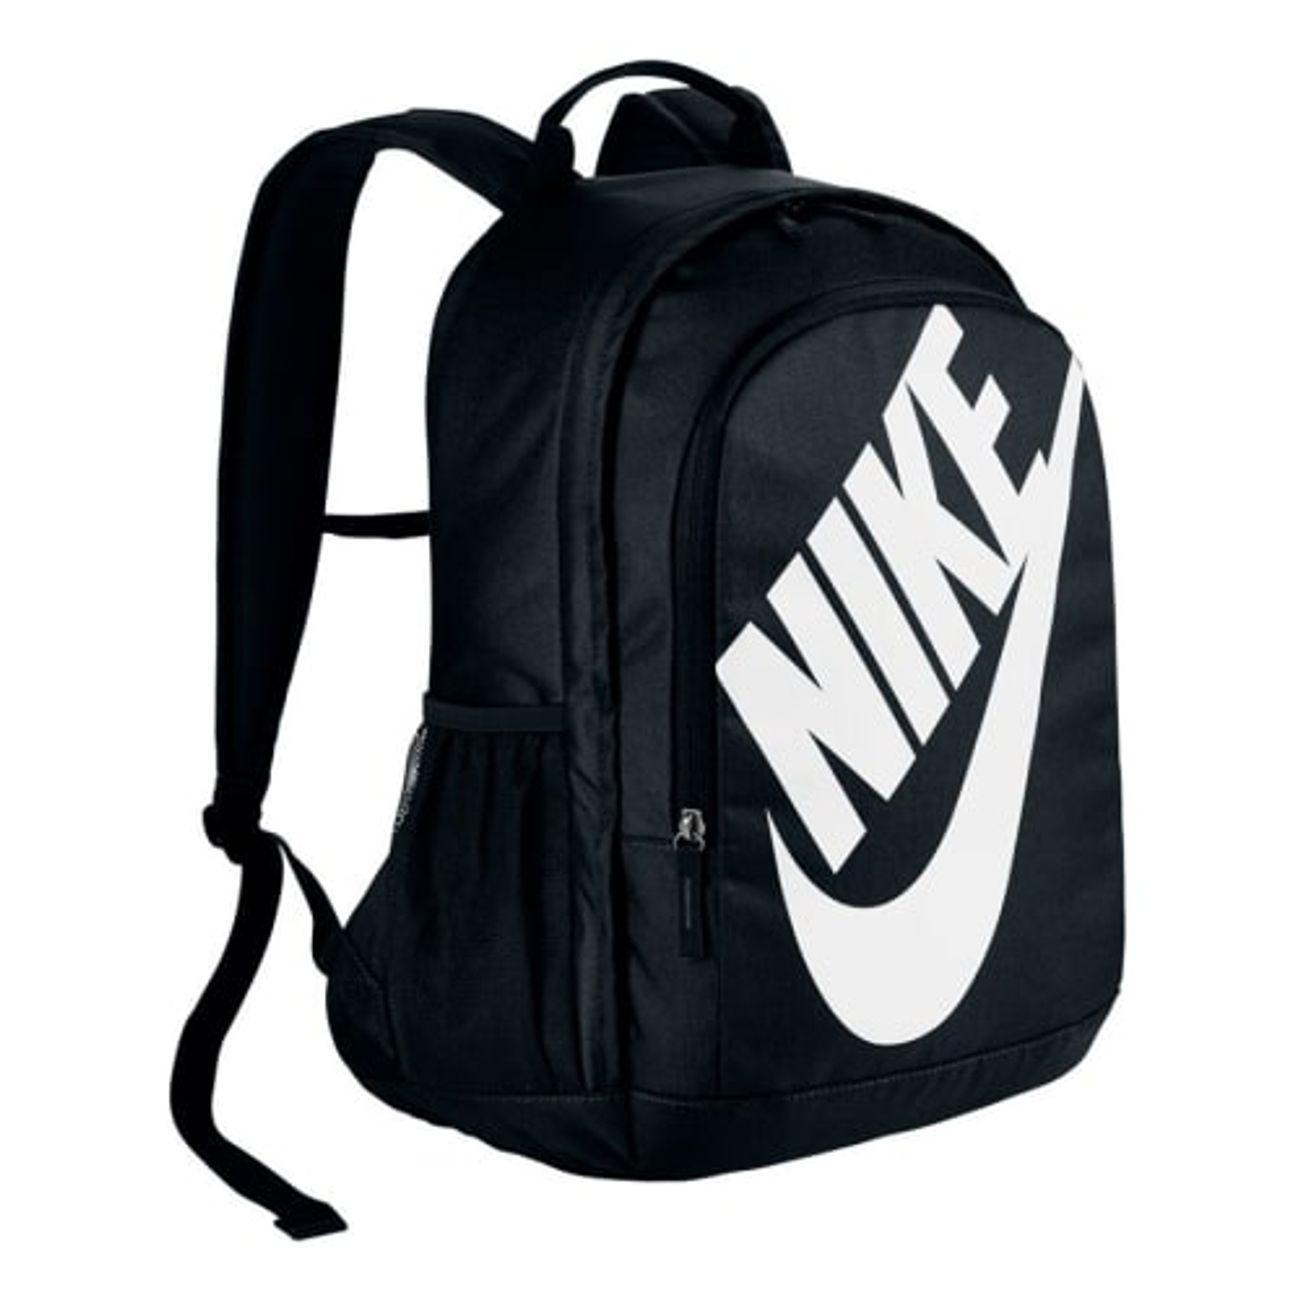 525fa12ea1 Sac à dos Nike Sportswear Hayward Futura noir blanc – achat et prix ...